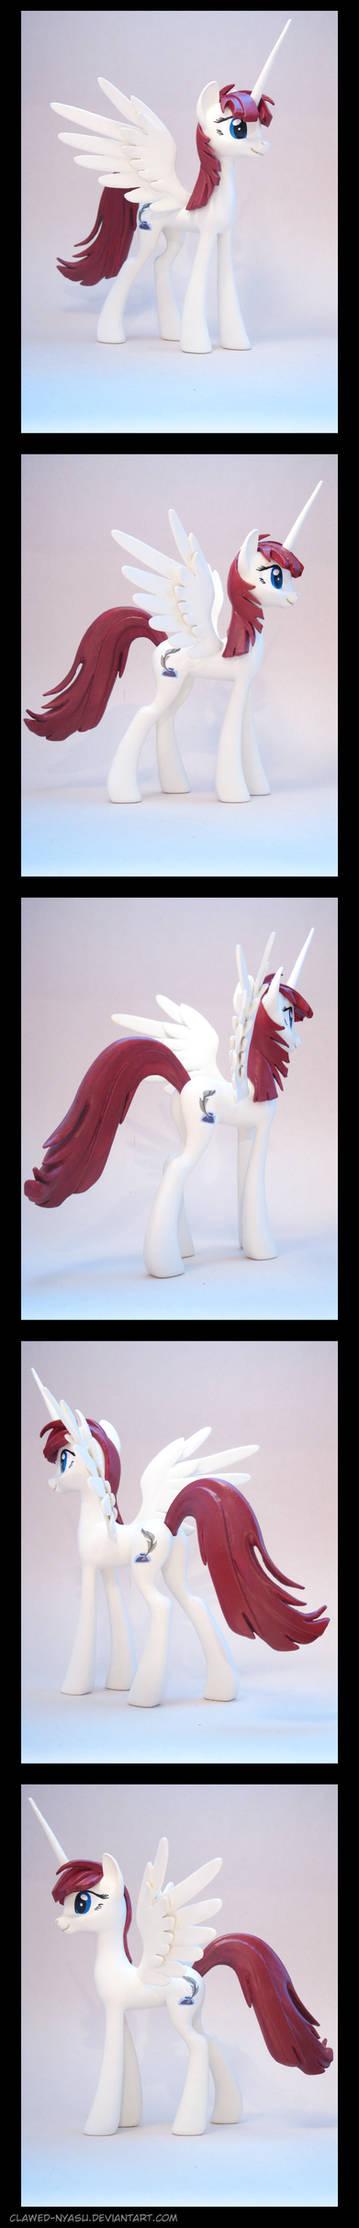 Fausticorn 3D Printed Figure